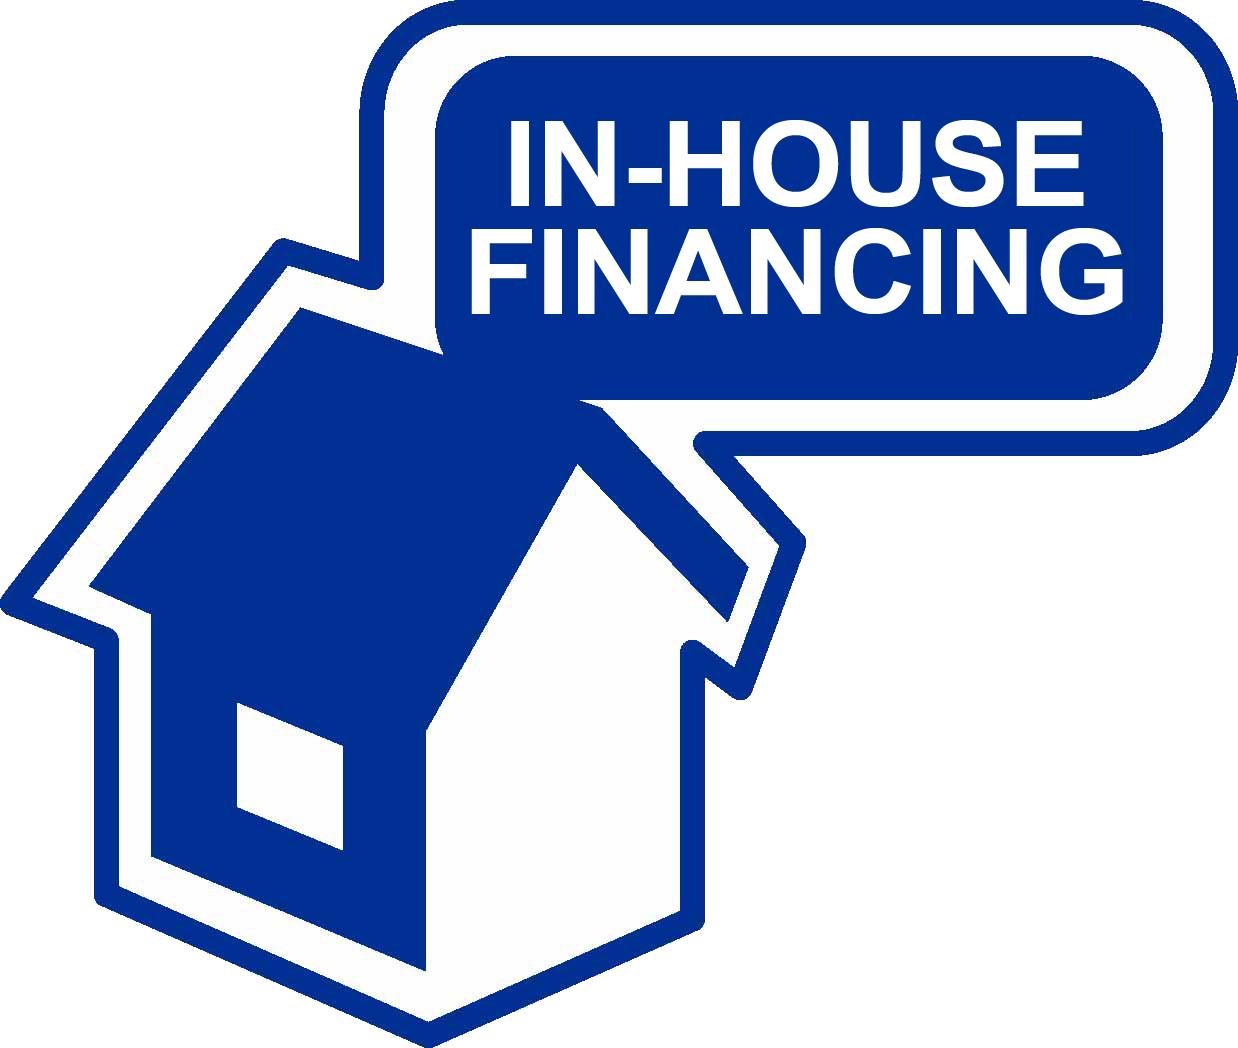 marketing clipart source finance